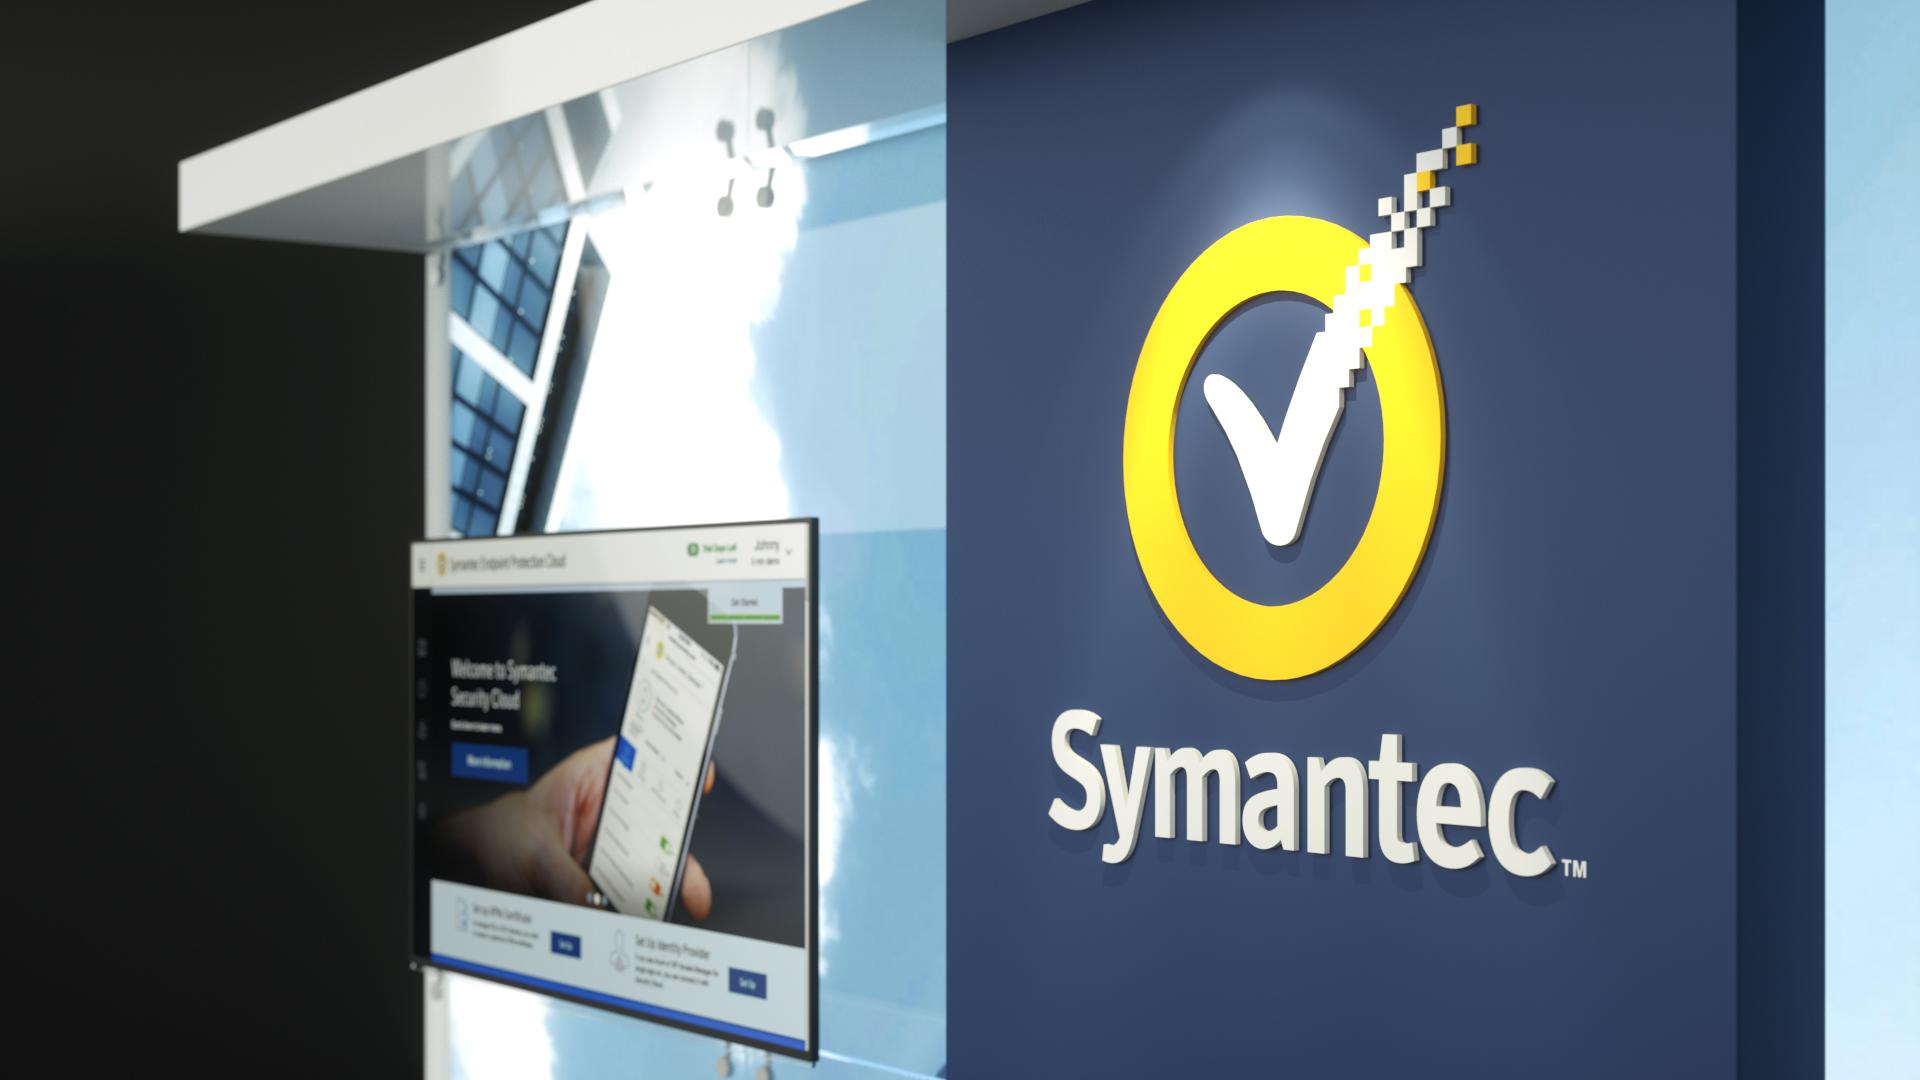 3417 - Symantec Canada - SecTor 2018 - View 3.jpg